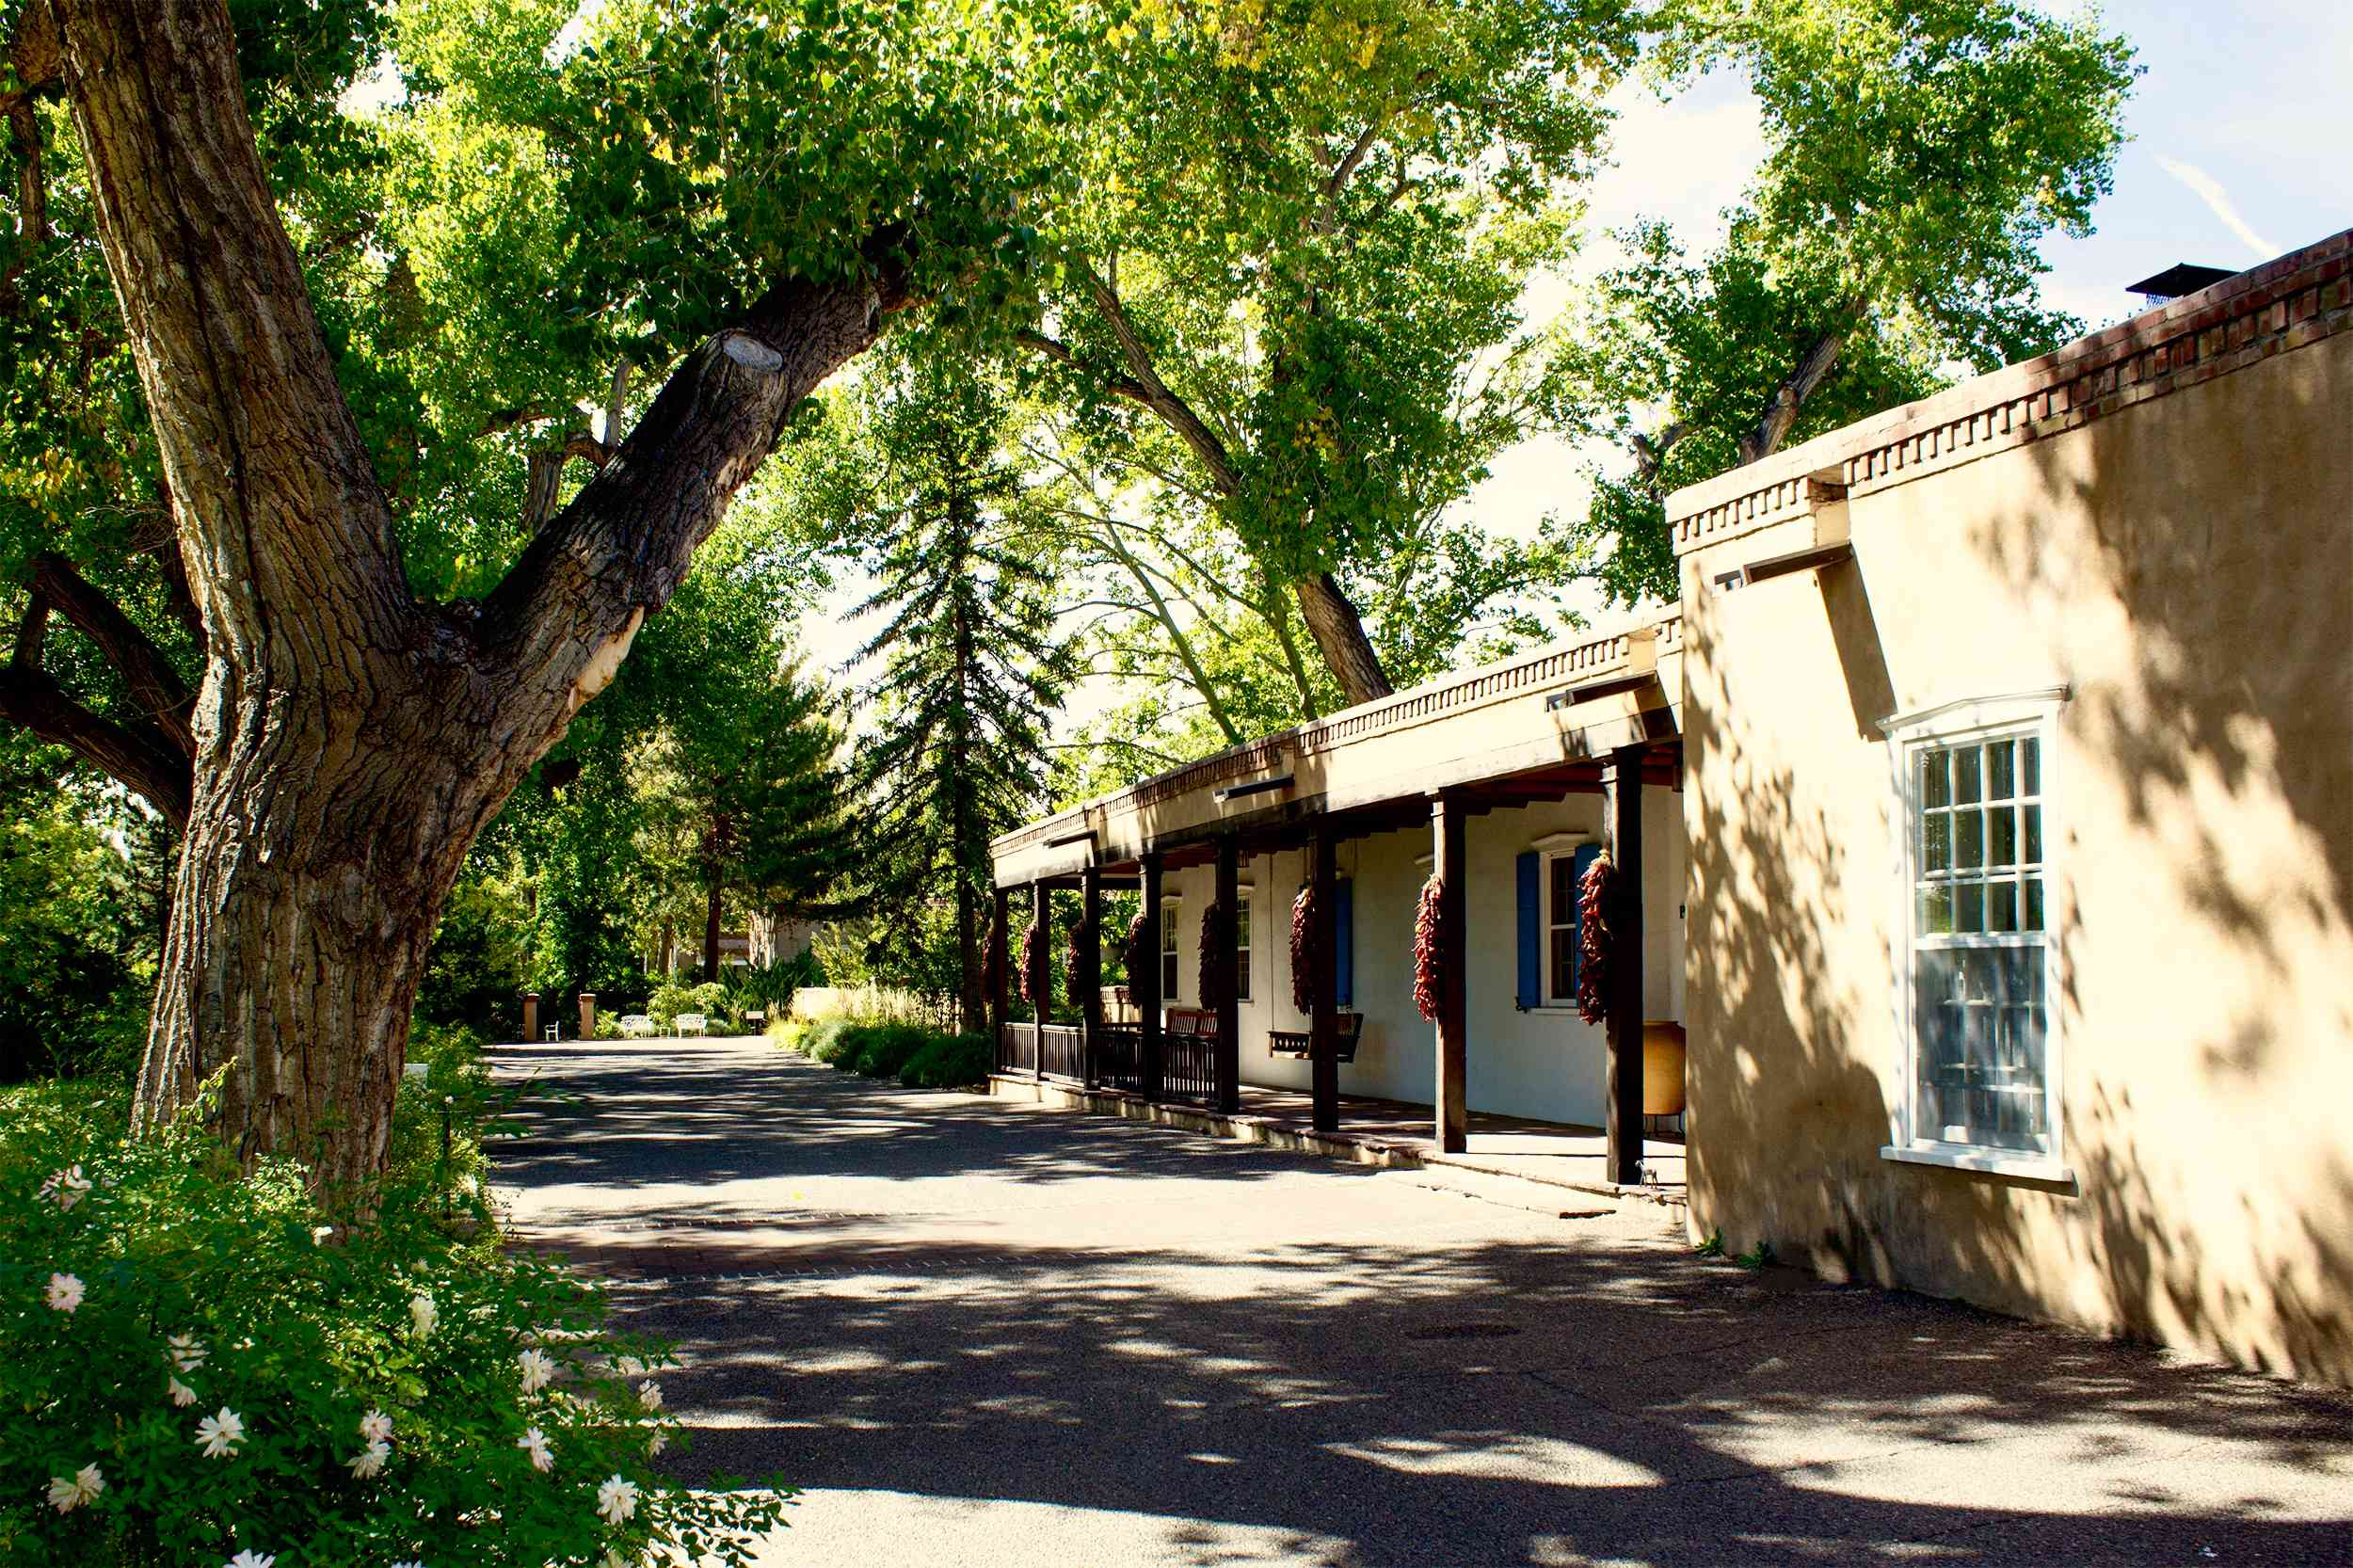 Los Poblanos, a historic inn set amidst 25 acres right in Albuquerque